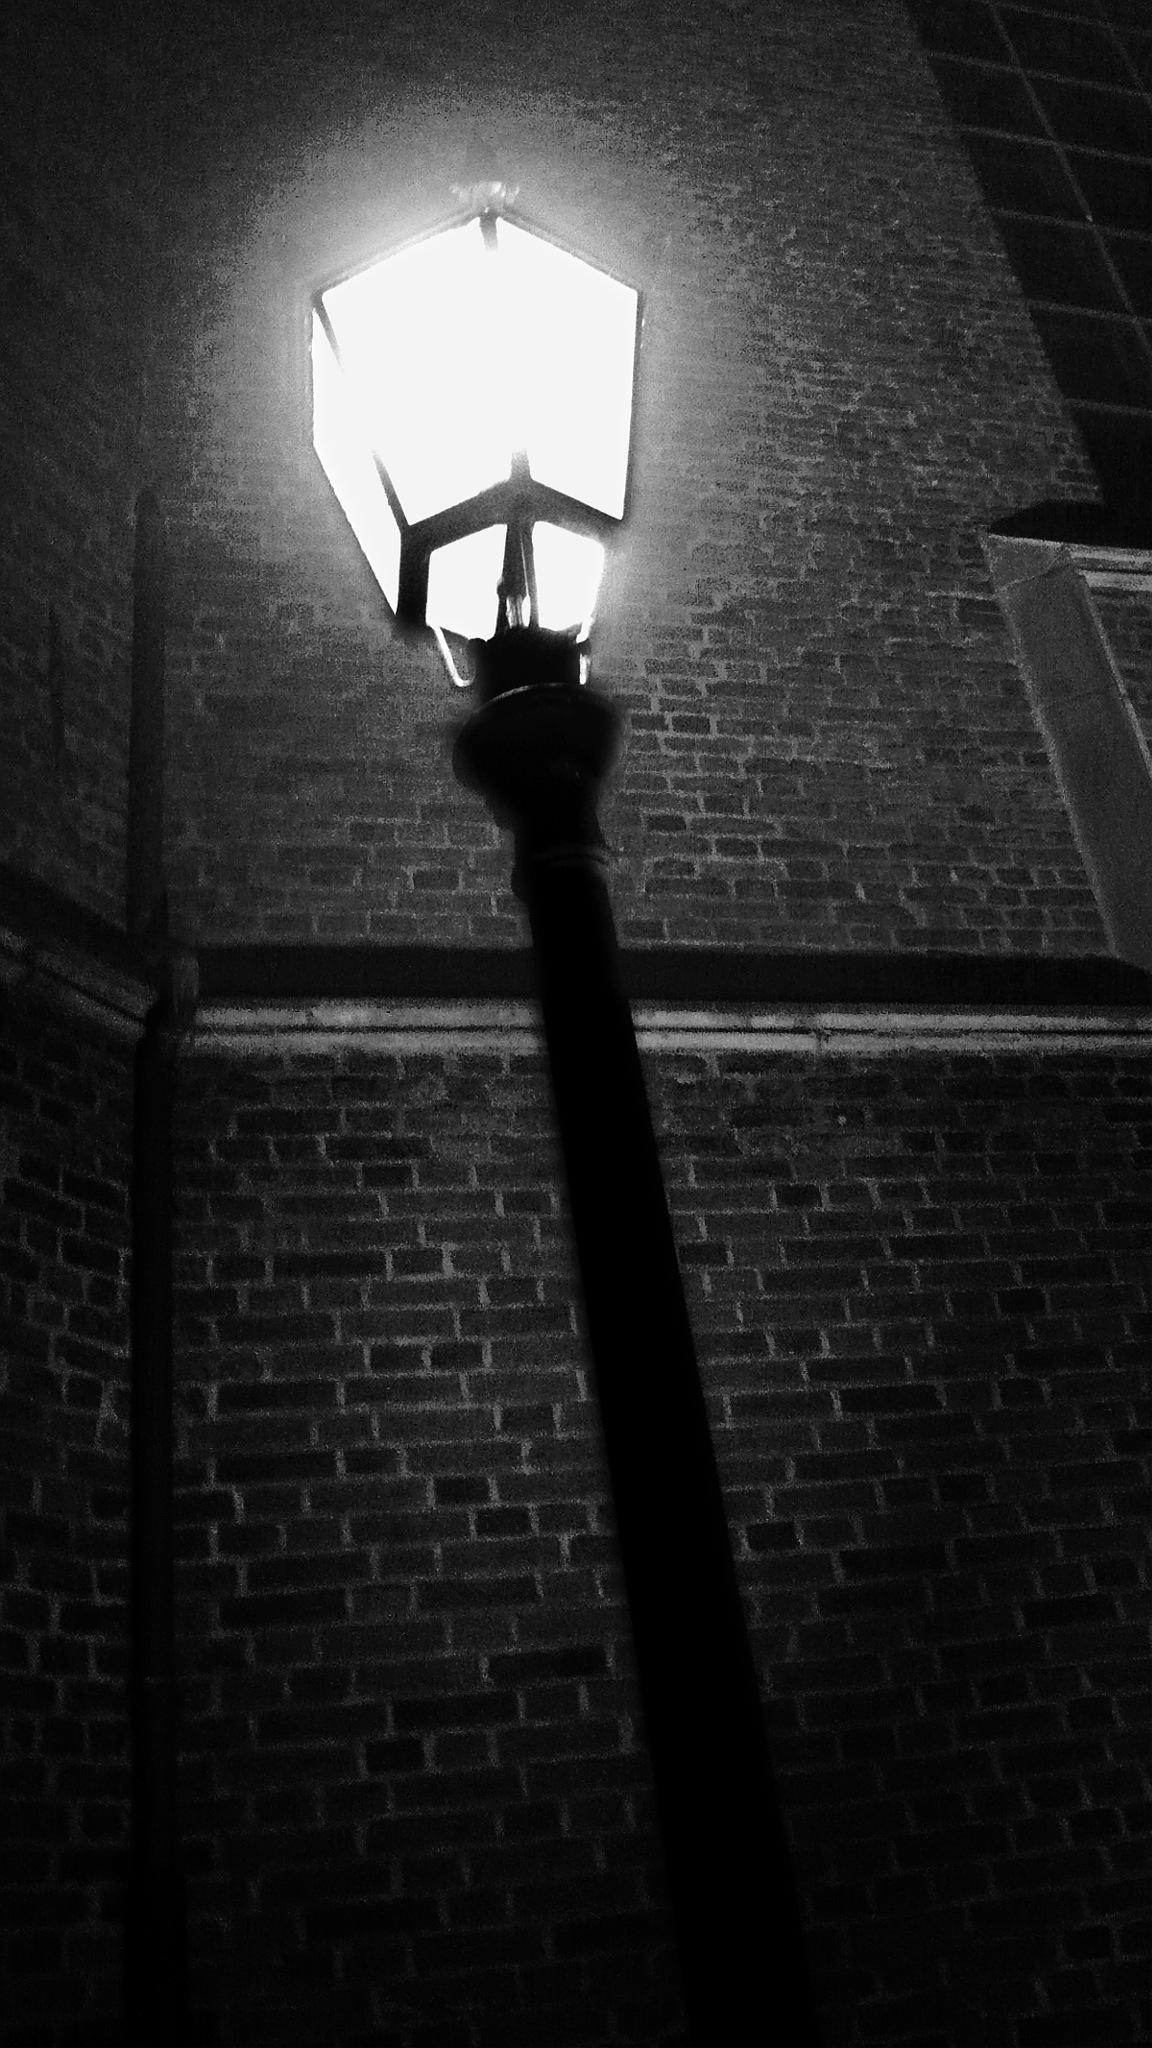 Street lamp by Gernot Schwarz